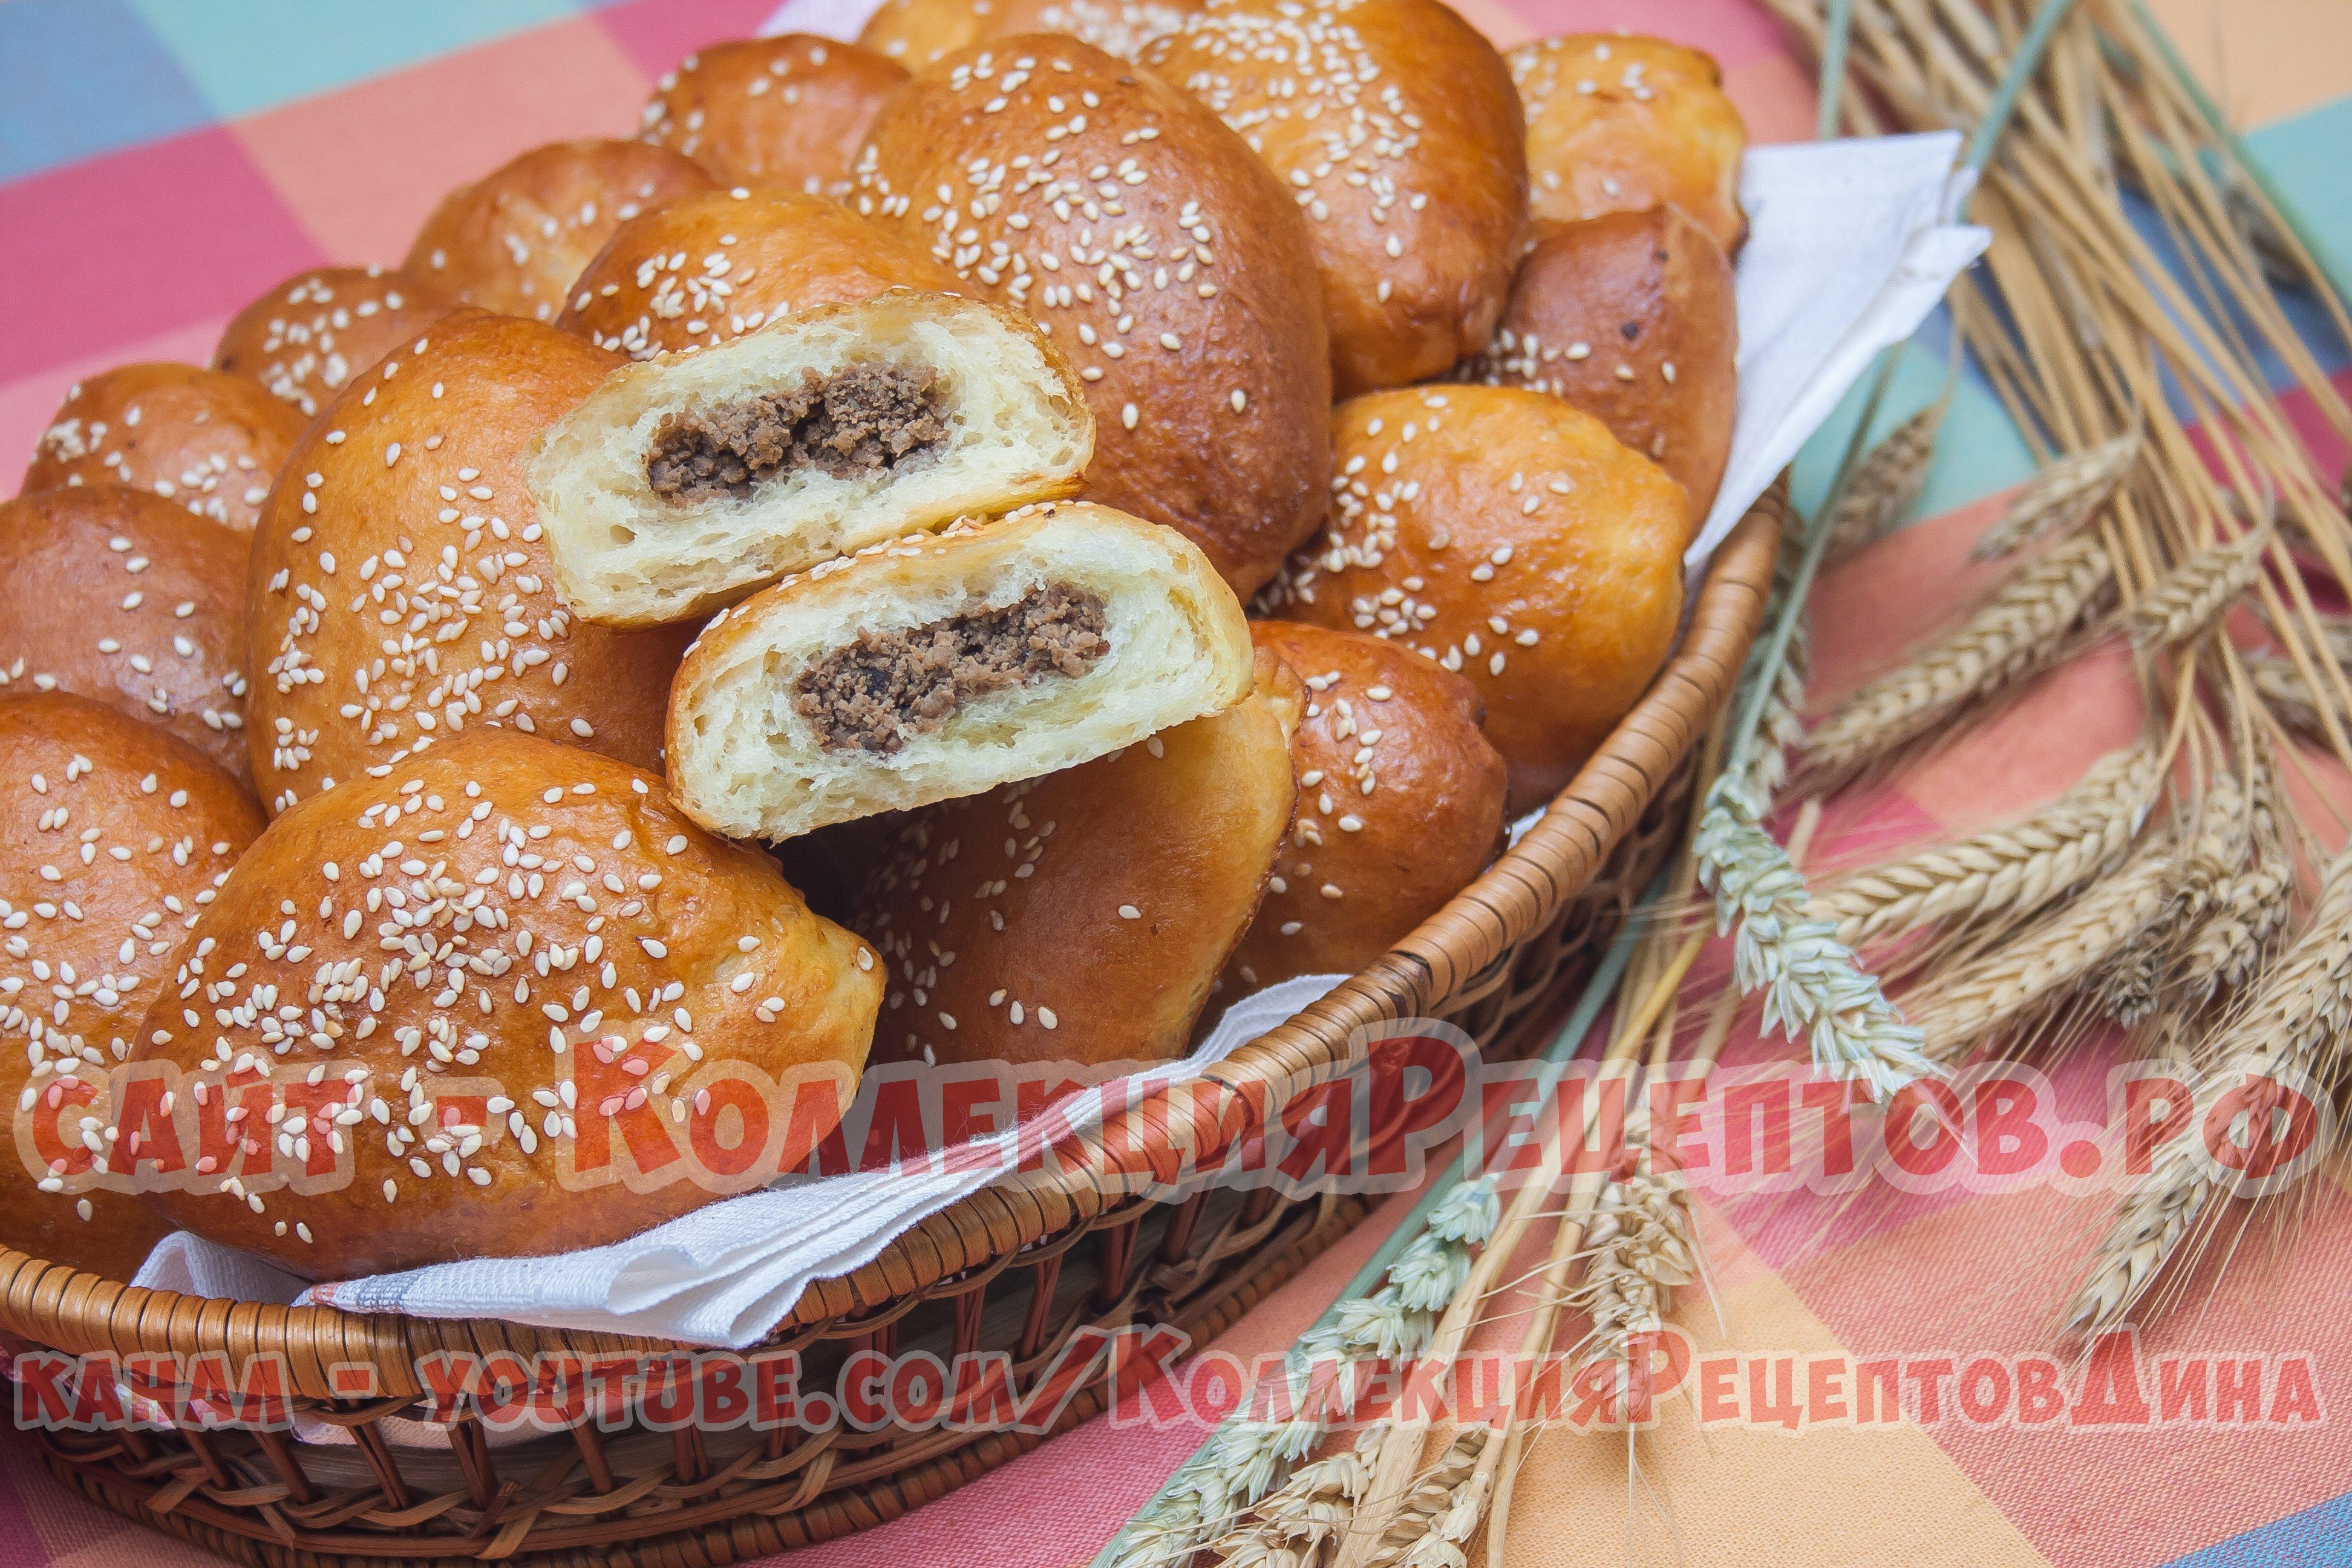 Рецепт теста на пирожки жареные с сухими дрожжами фото пошагово